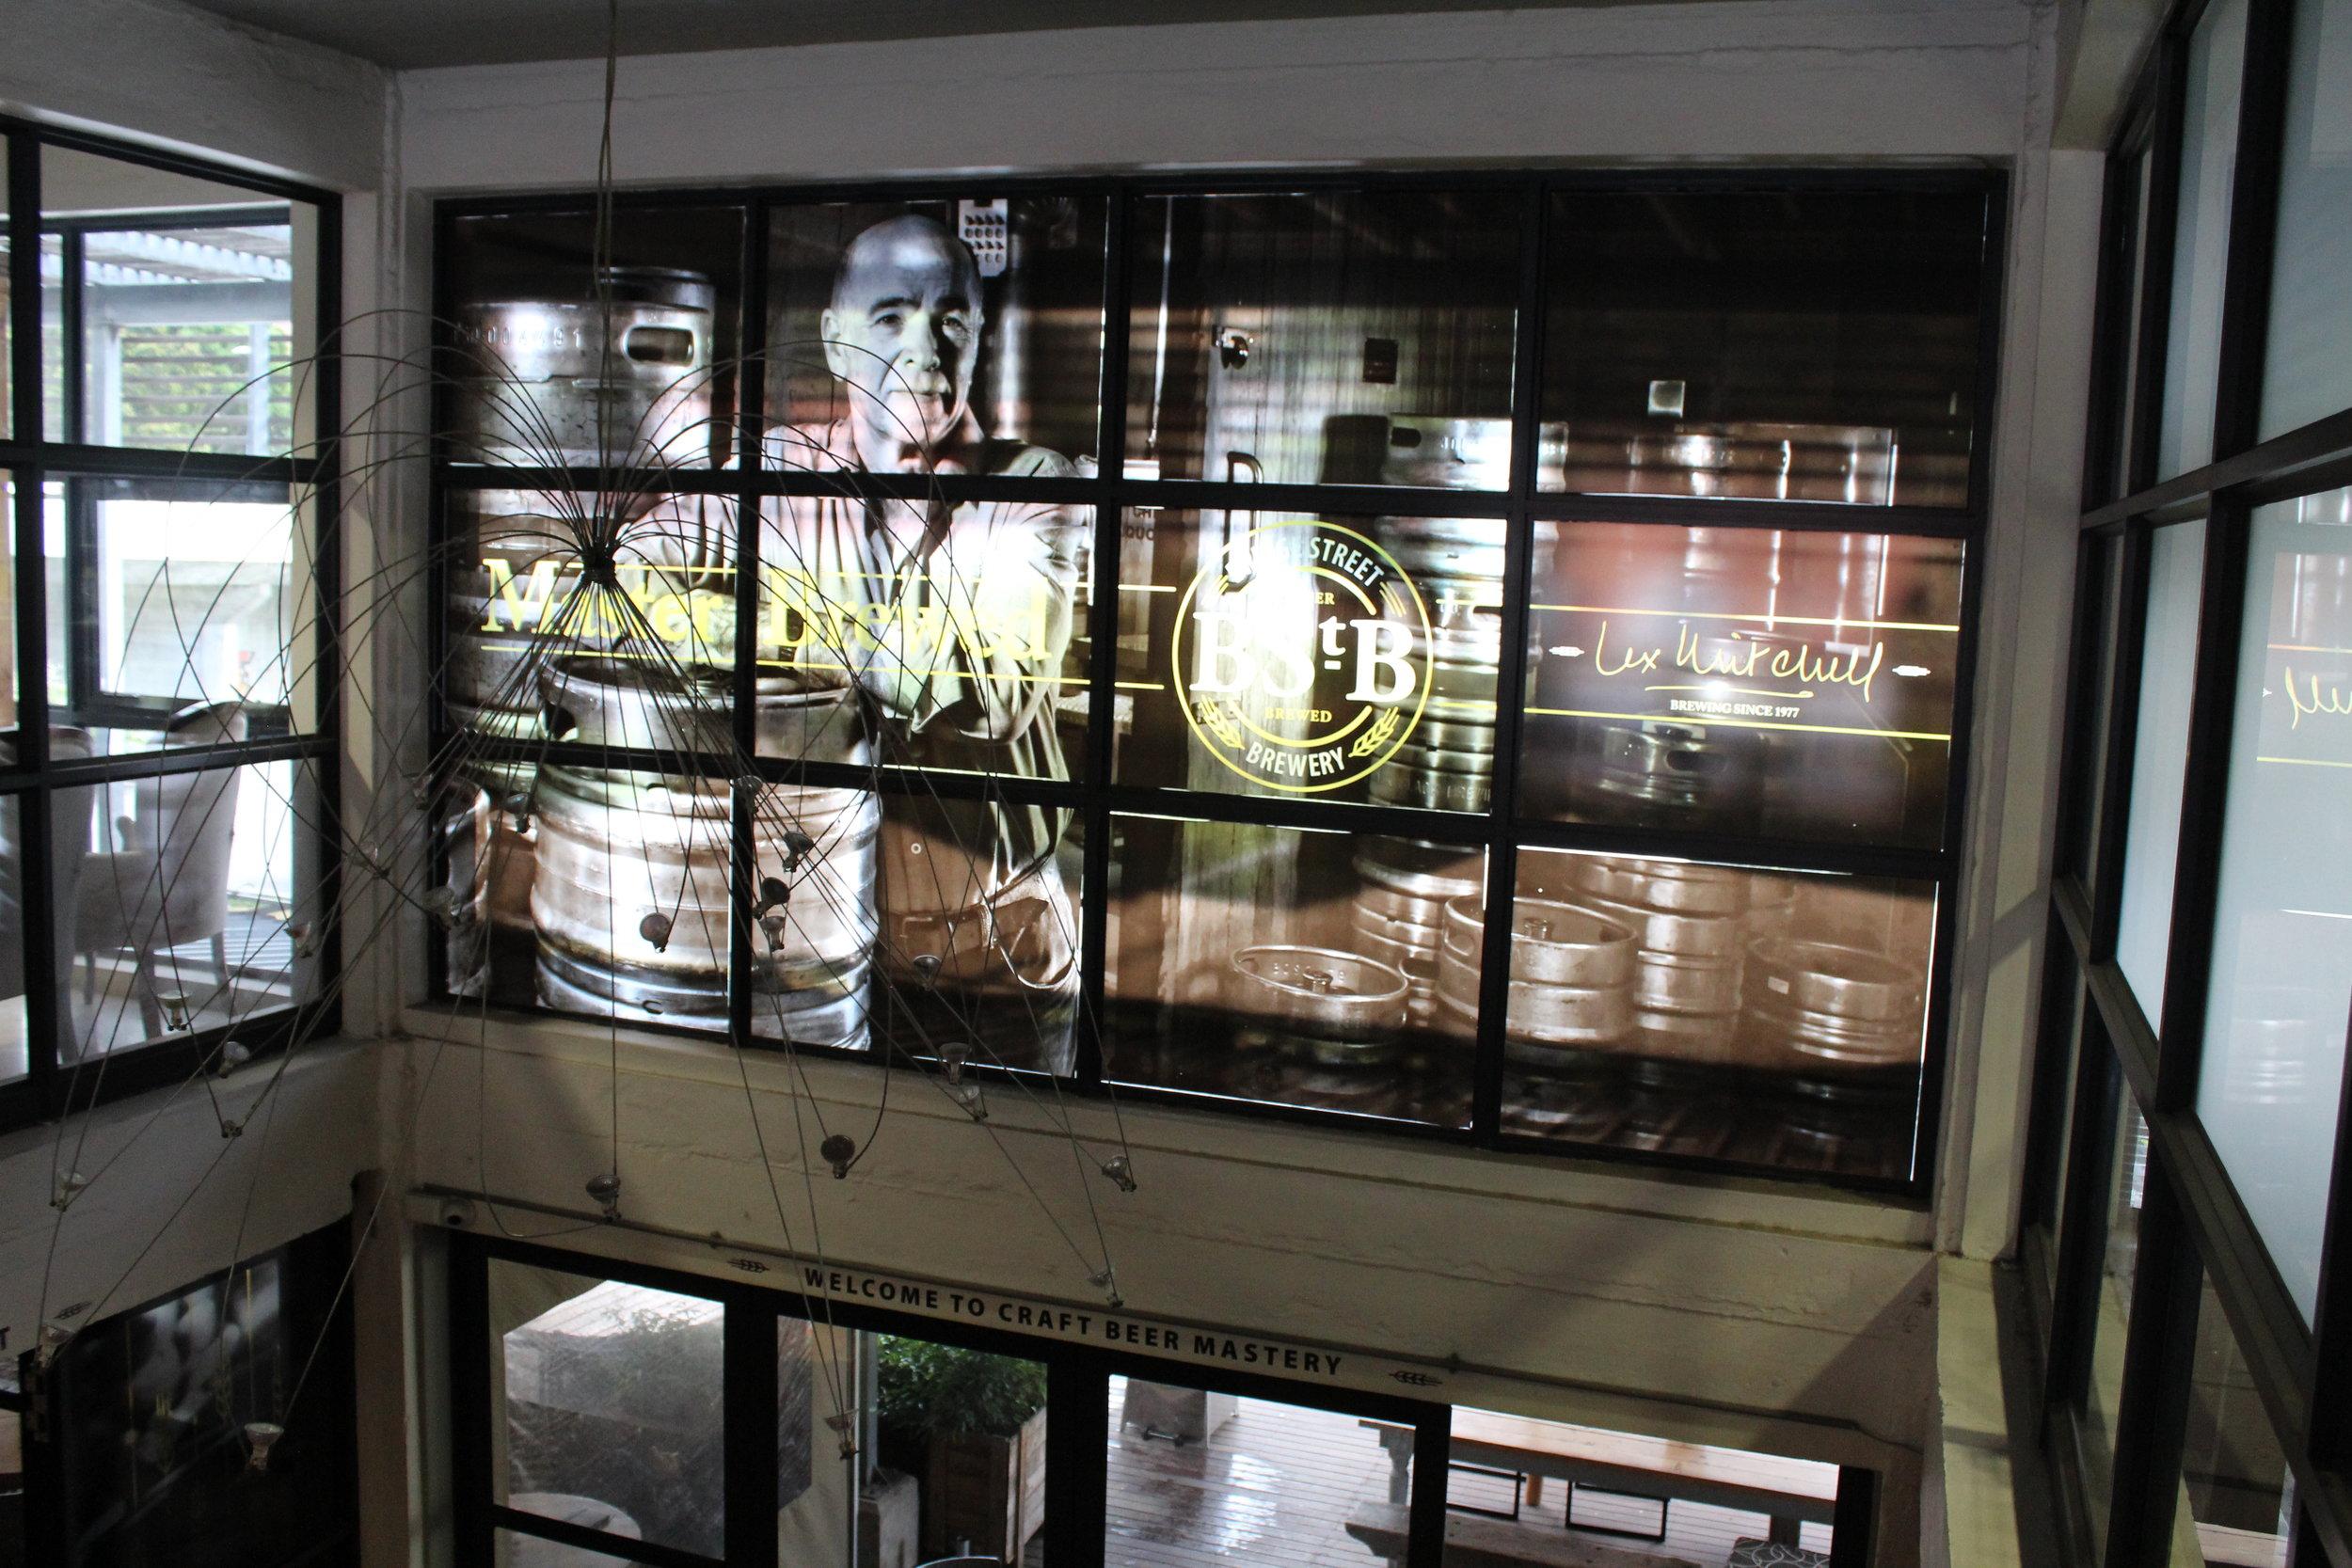 Lex Mitchell is the resident master brewer at Bridge Street Brewery.